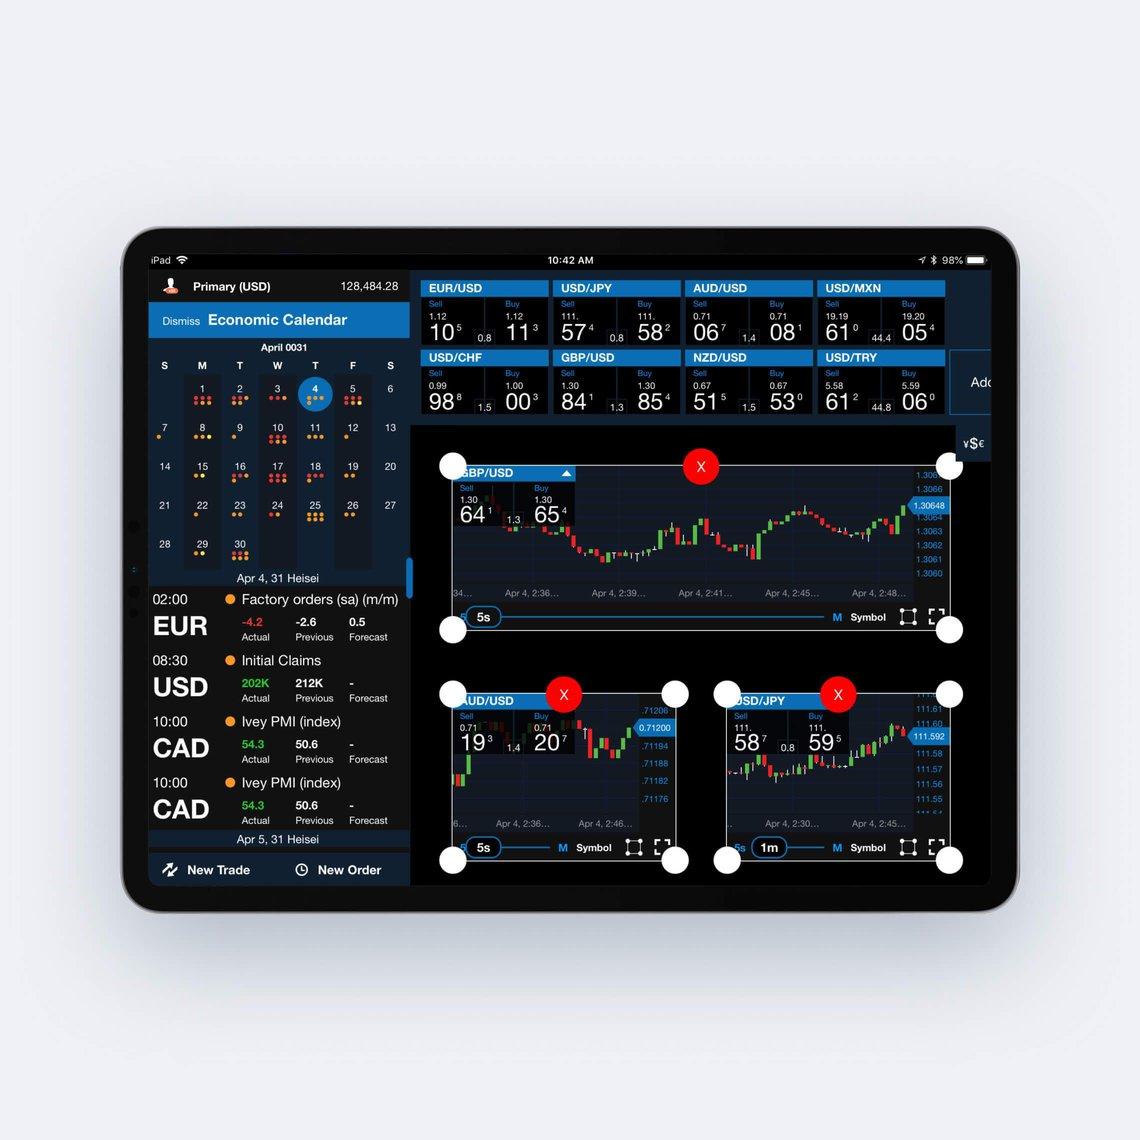 platforms_custom_interface.jpg